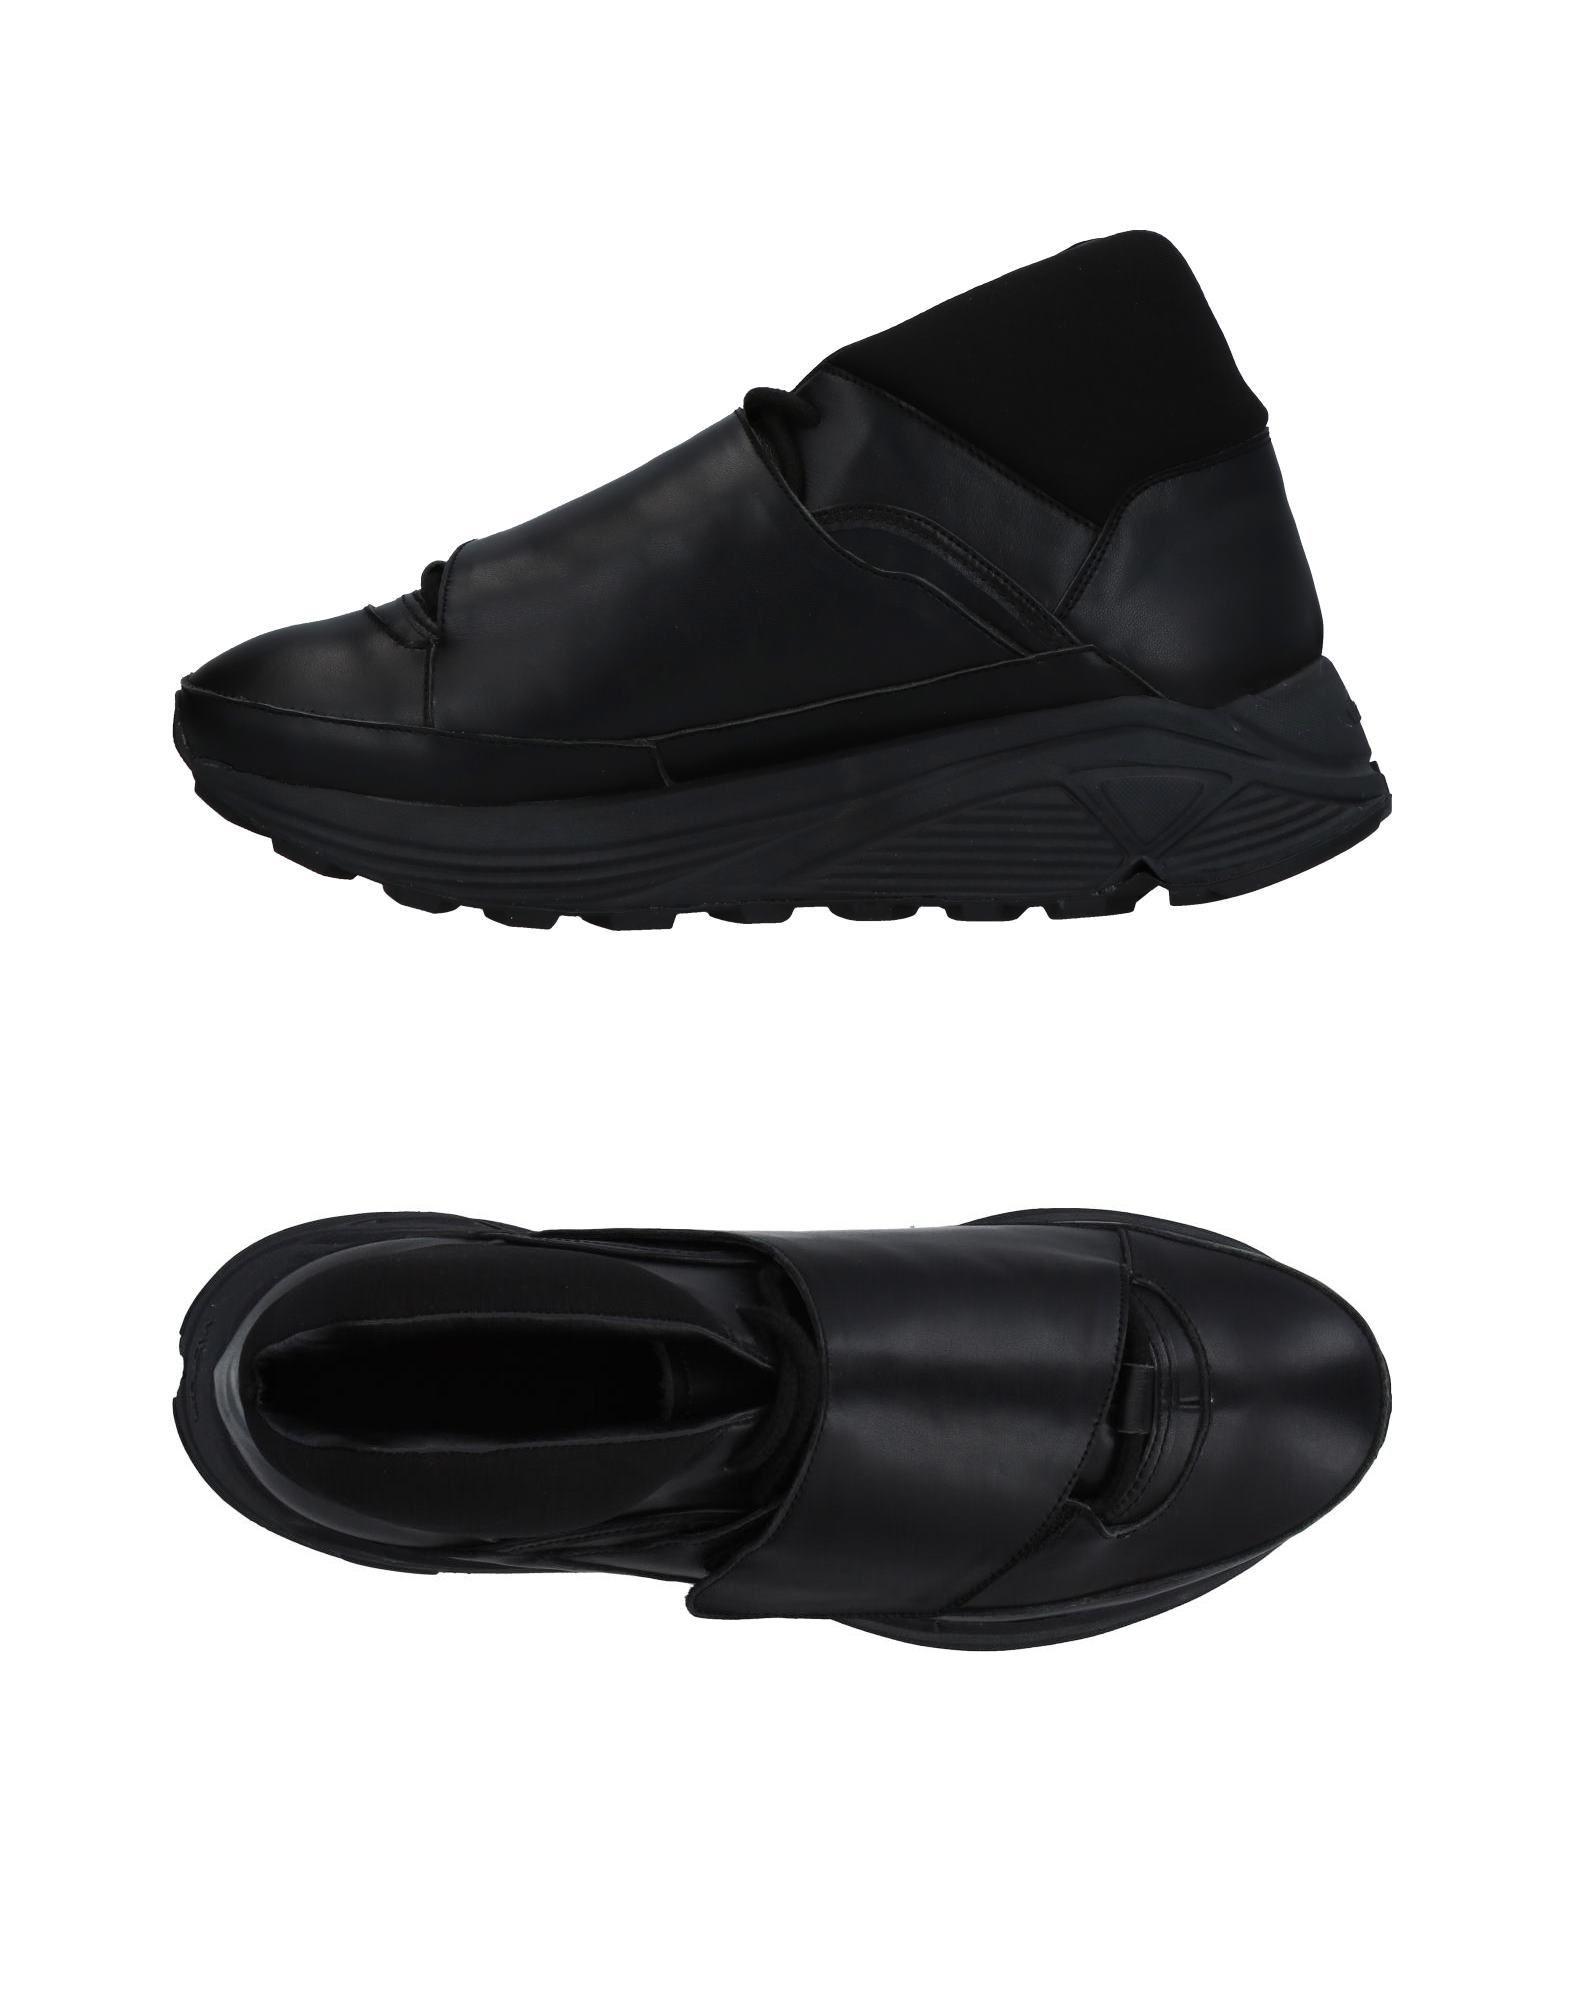 KKtP Высокие кеды и кроссовки кеды кроссовки высокие dc council mid tx stone camo